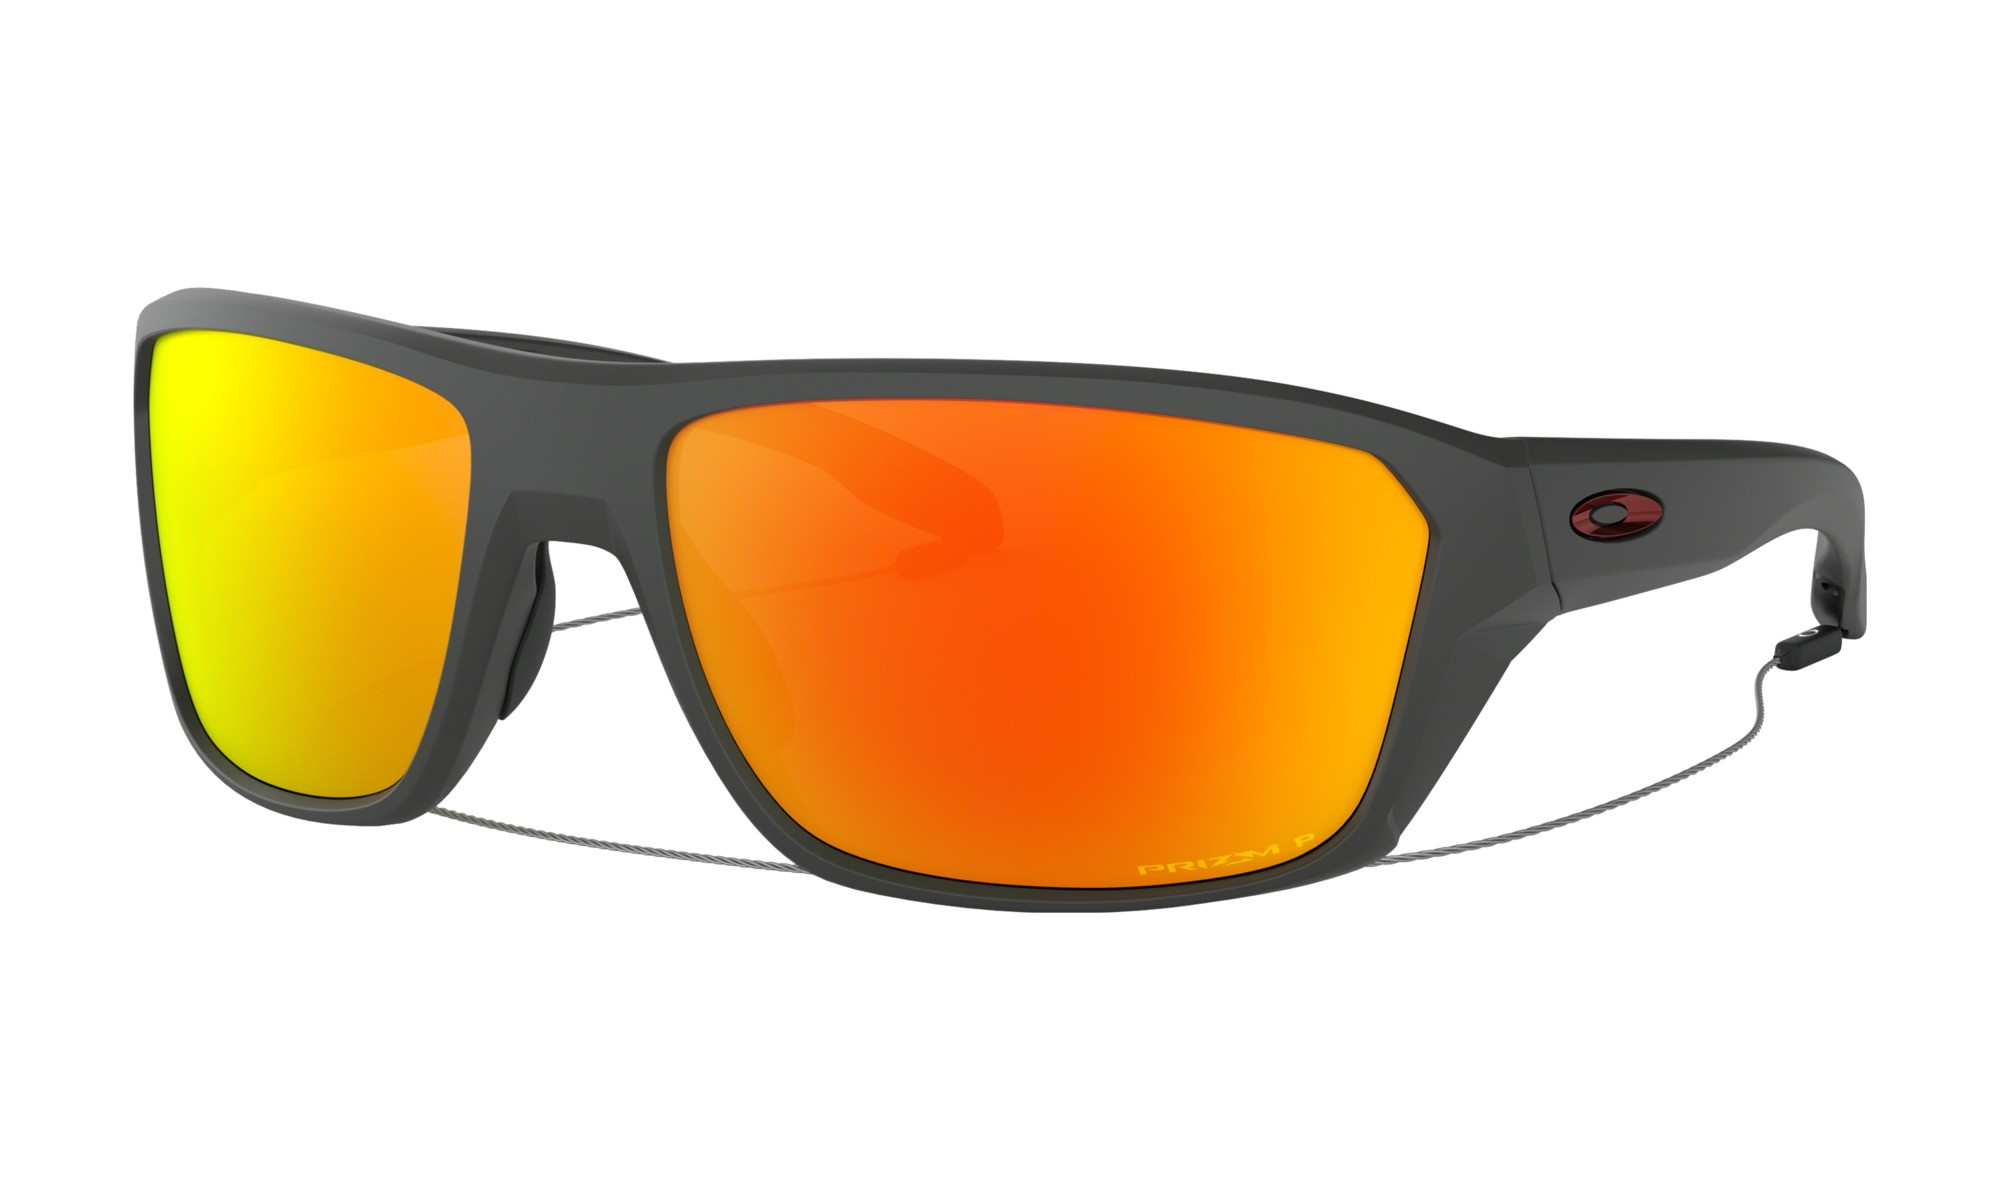 1a3311716b Oakley Split Shot Matte Heather Grey Prizm Ruby Polarized Sunglasses